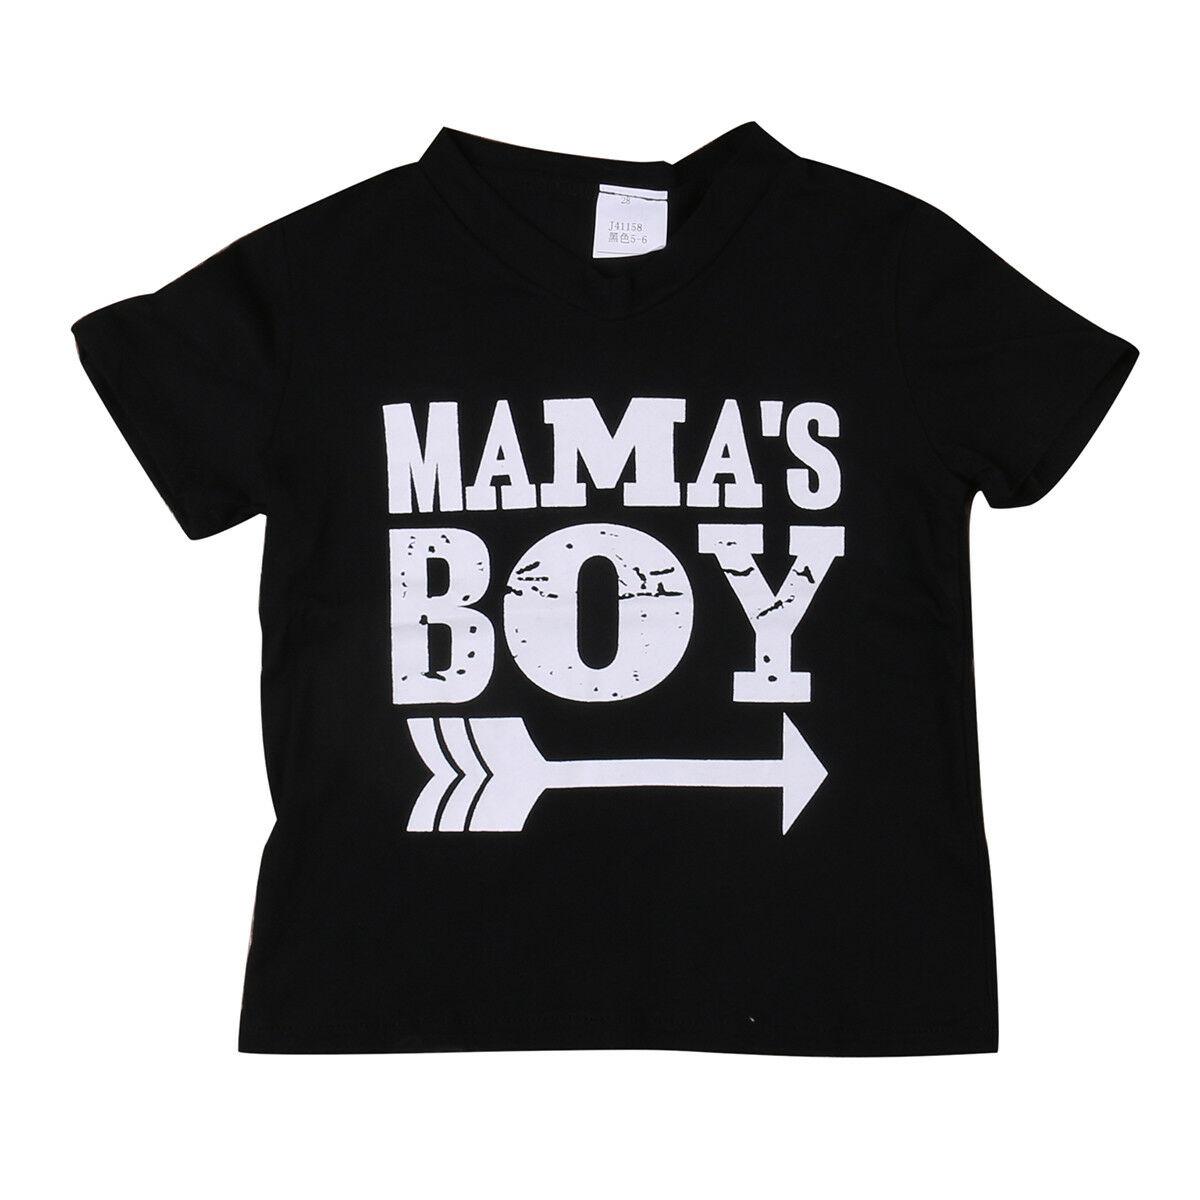 T-Shirt Tops Newborn Toddler Infant Baby-Boys Kids Cotton Children Summer Letter 0-24M